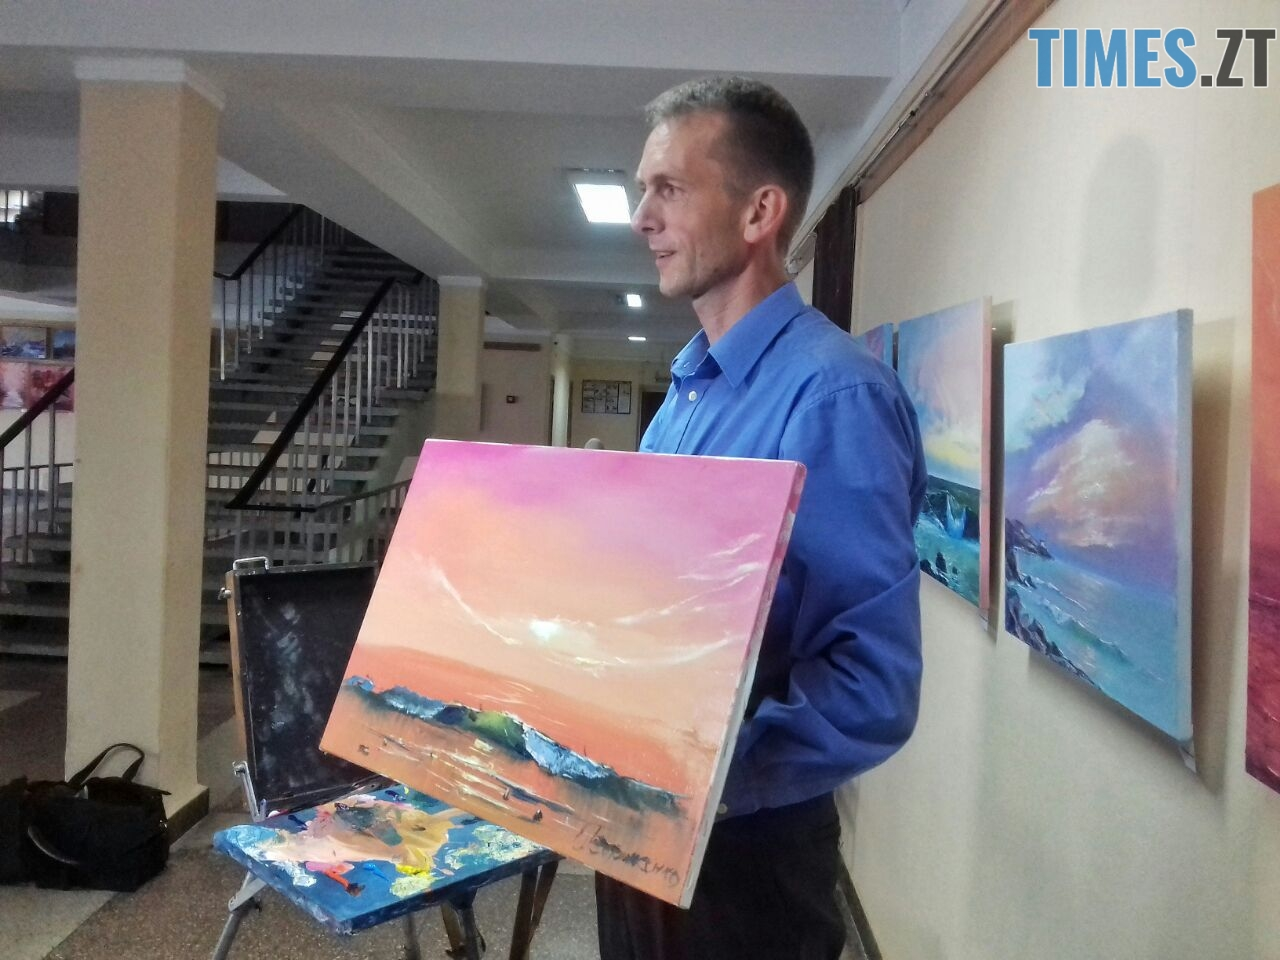 WhatsApp Image 2018 09 01 at 12.12.47 - Мистецтво нашвидкуруч: митець показав, як намалювати картину за 20 хвилин (ФОТО)